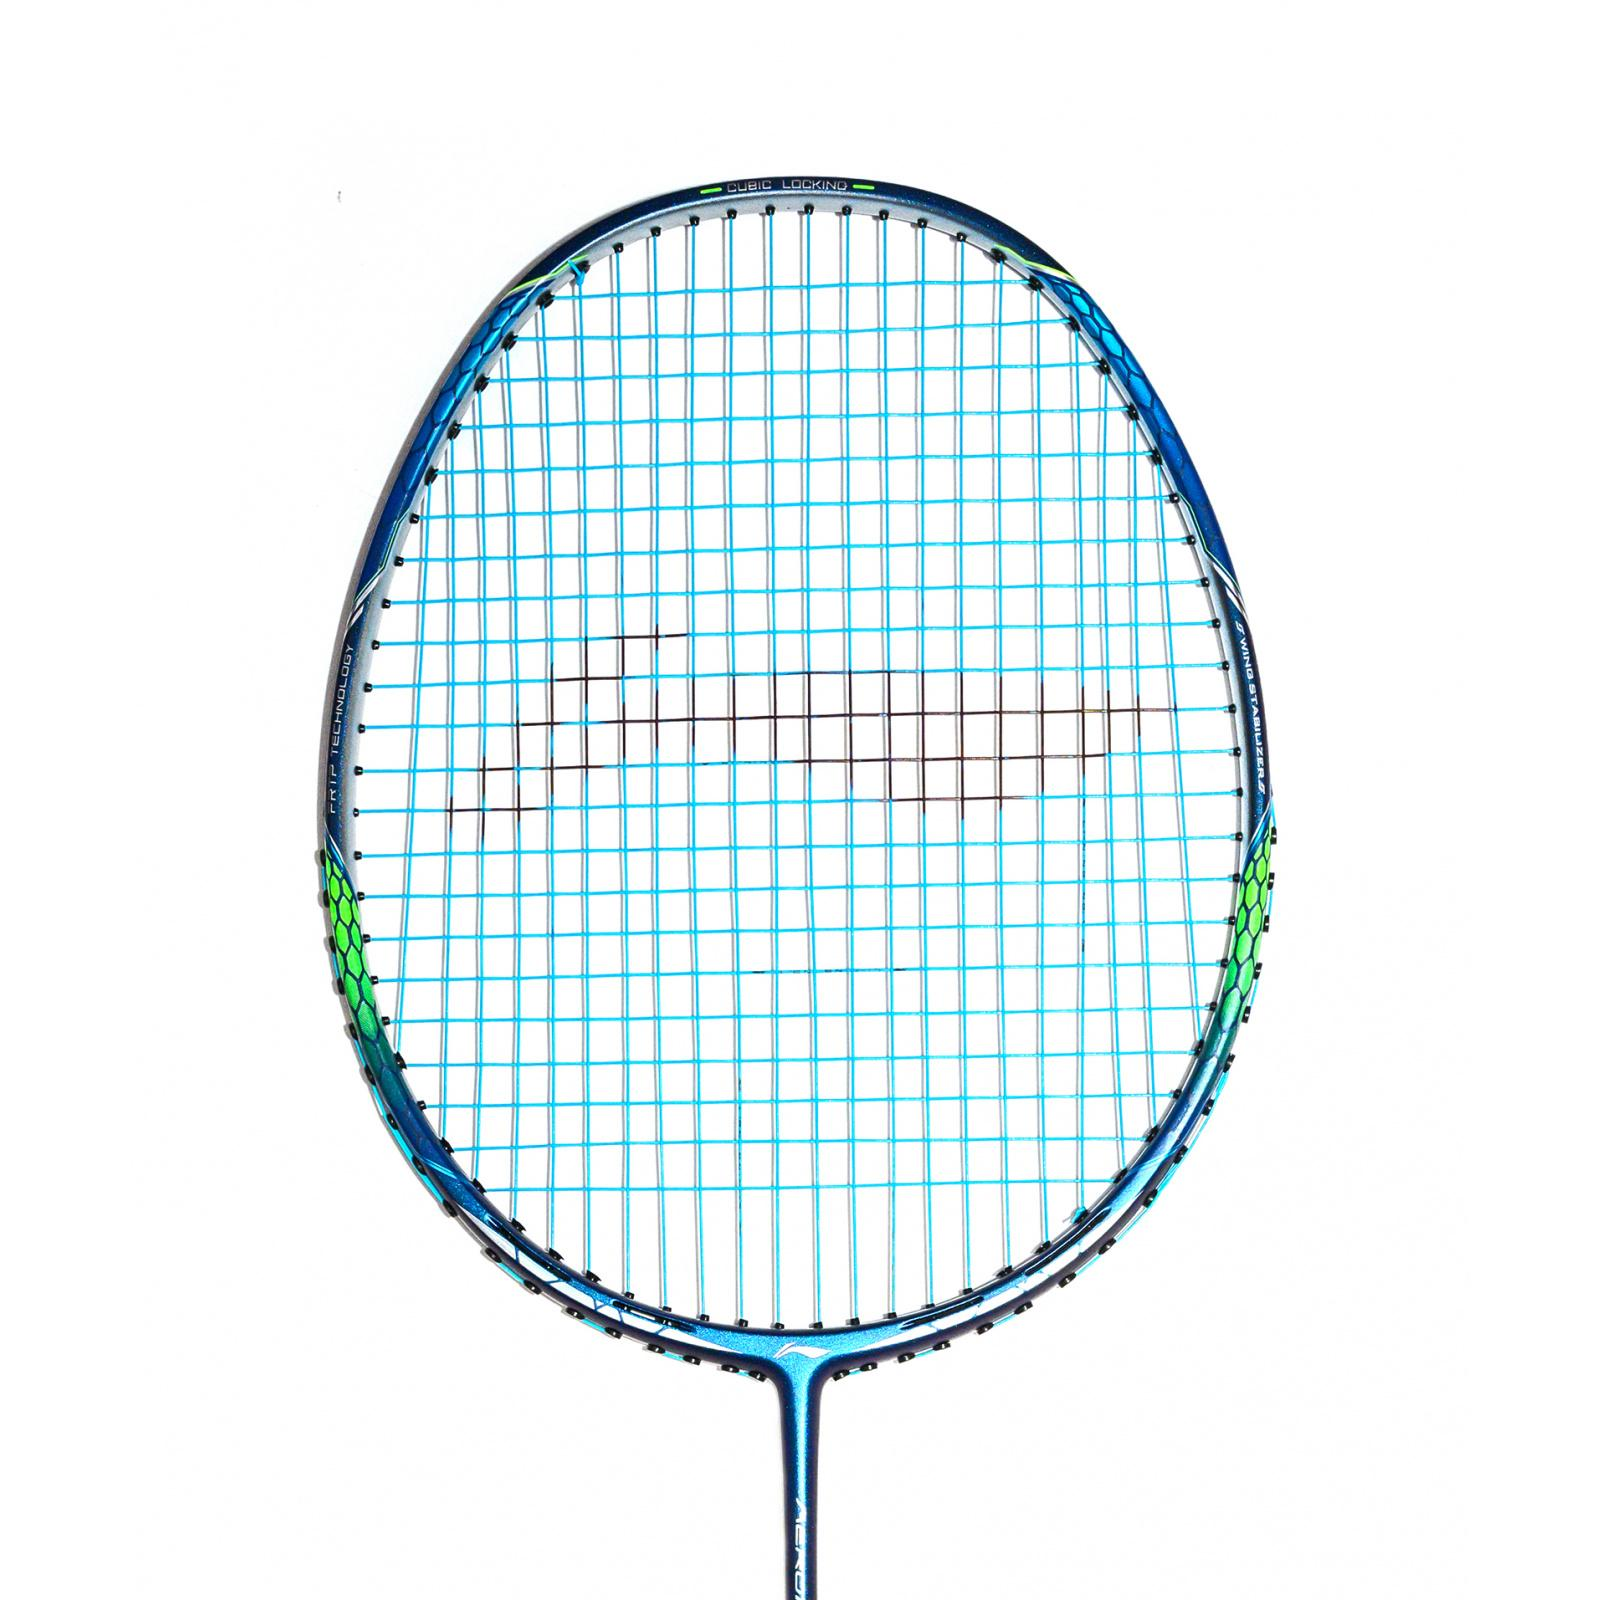 https://www.badec.store/produkty_img/badmintonova-raketa1570563198L.jpg